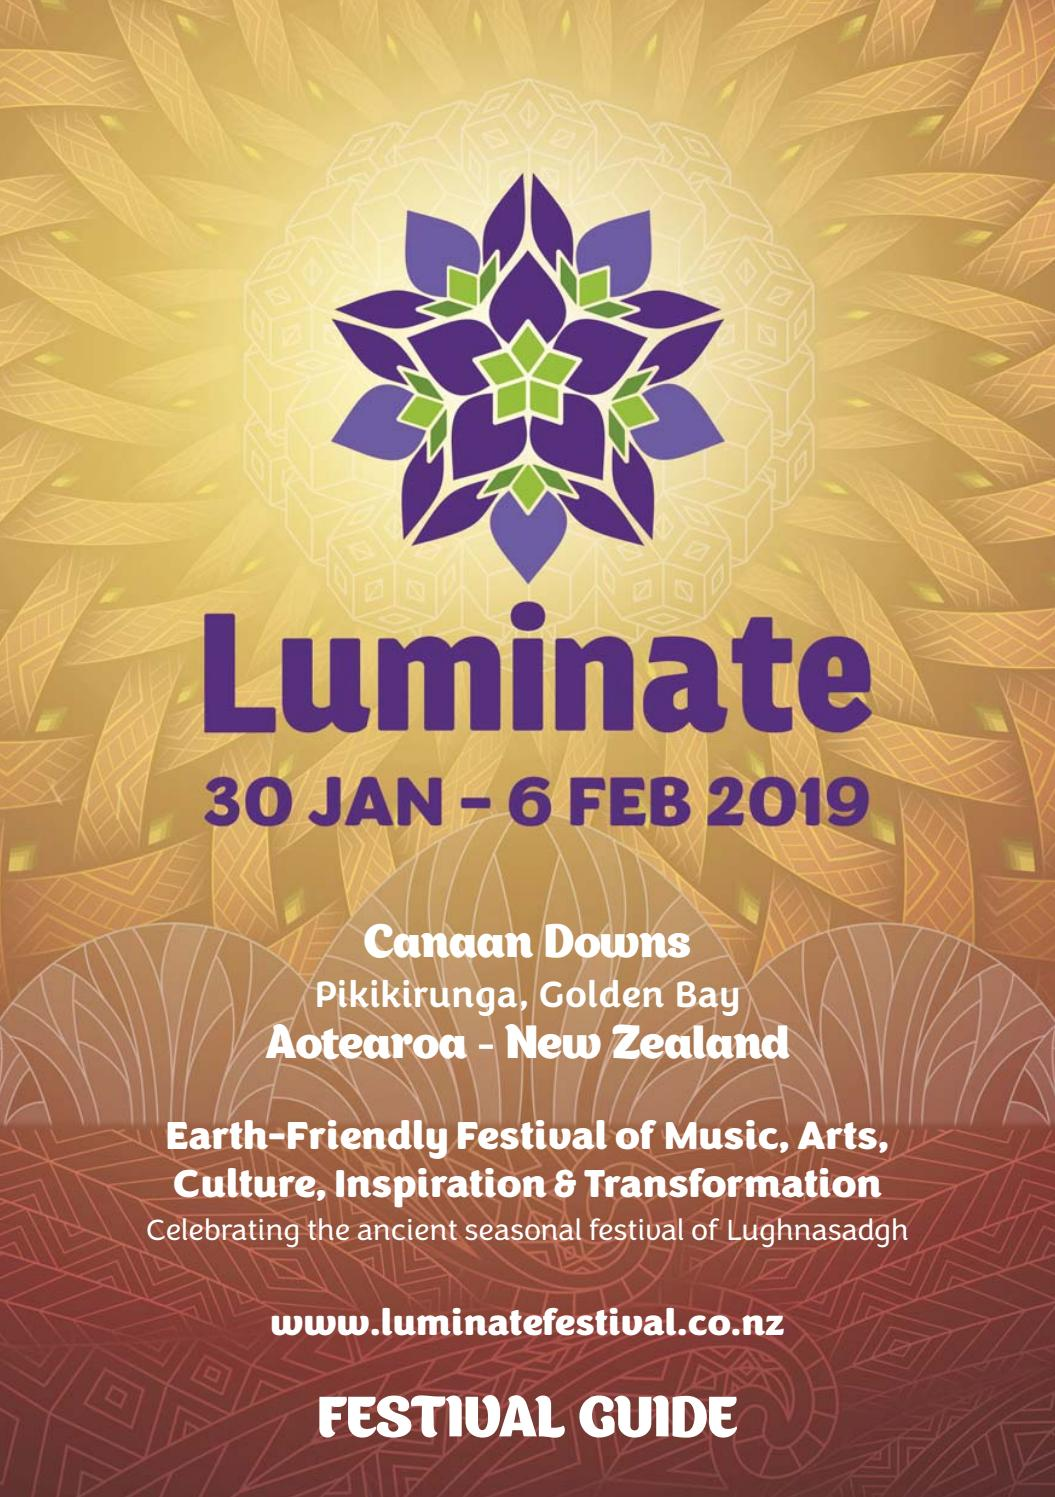 19e1709dd8 Luminate Festival Guide 2019 by Luminate Festival - issuu